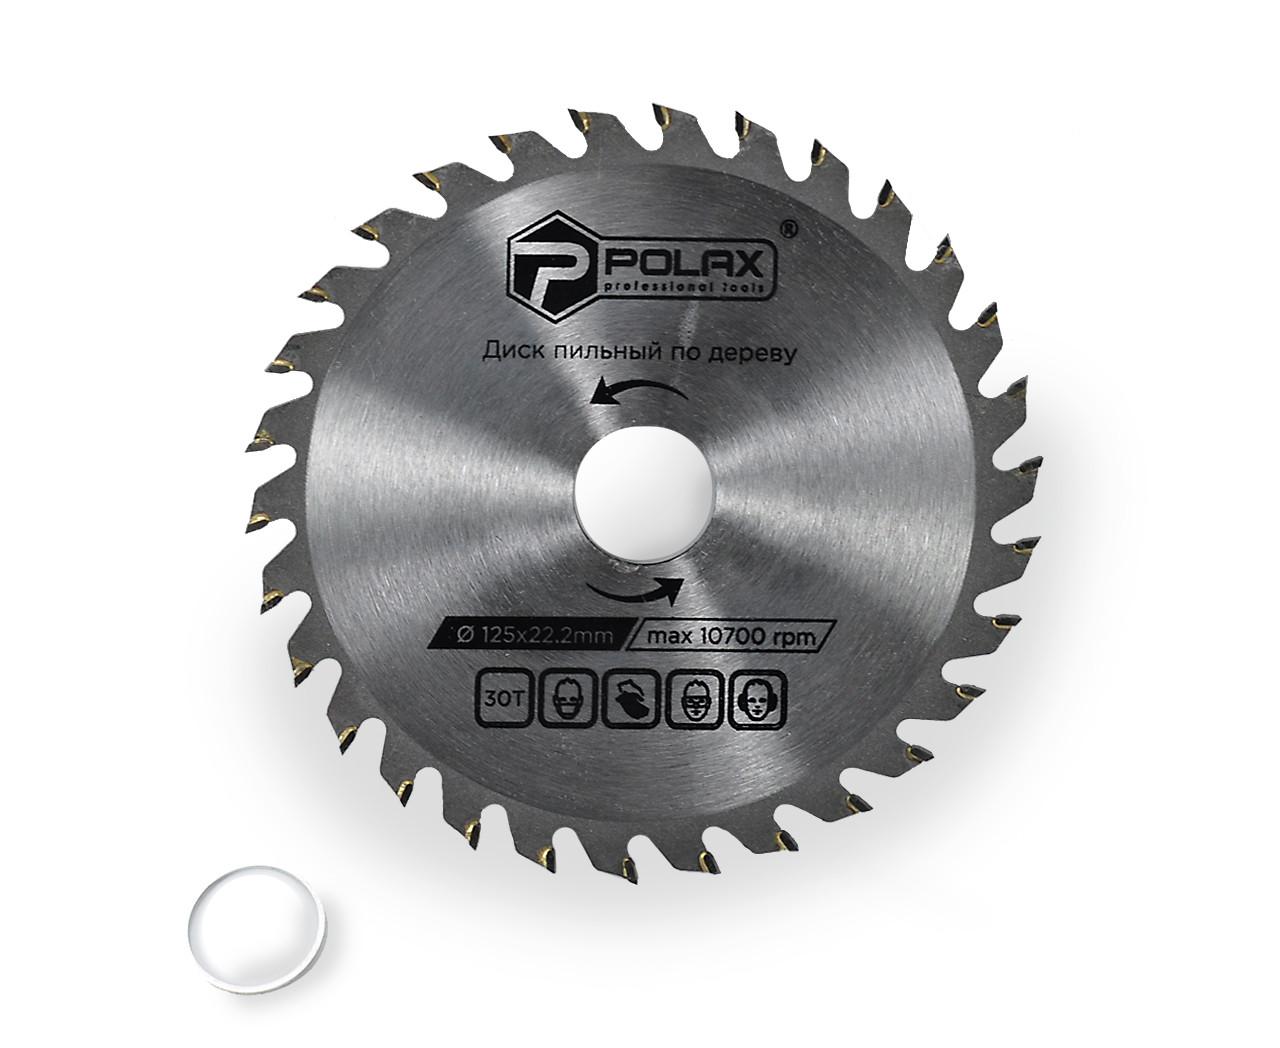 "ТМ ""POLAX"" Пила дискова по дереву с твердосплавными напайками 350x32,0, 56Т (шт.)"